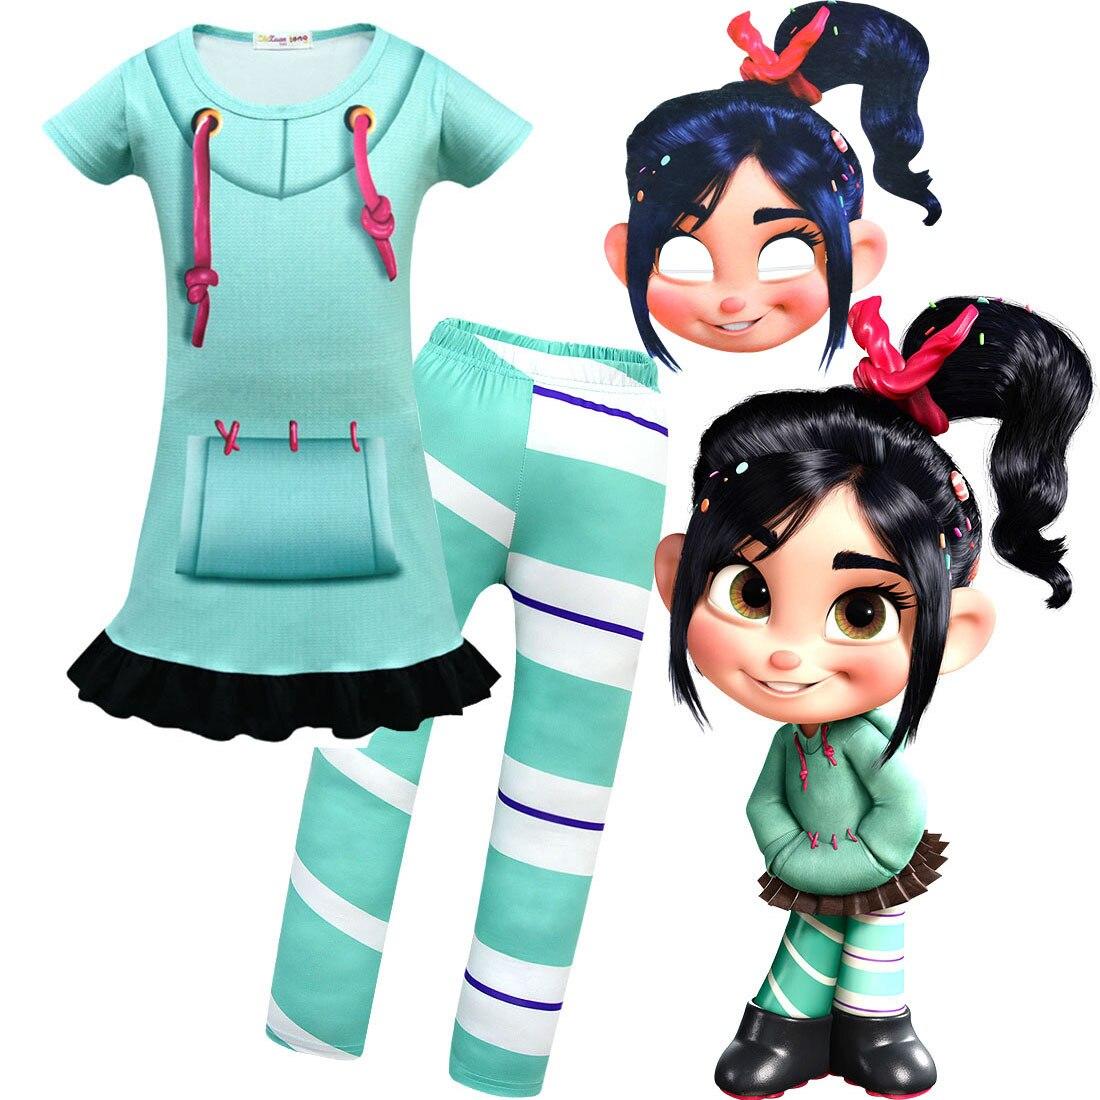 girls-wreck-it-ralph-2-clothes-vanellope-von-schweetz-font-b-vocaloid-b-font-cosplay-halloween-costume-kids-dress-pants-sets-clothing-for-girl